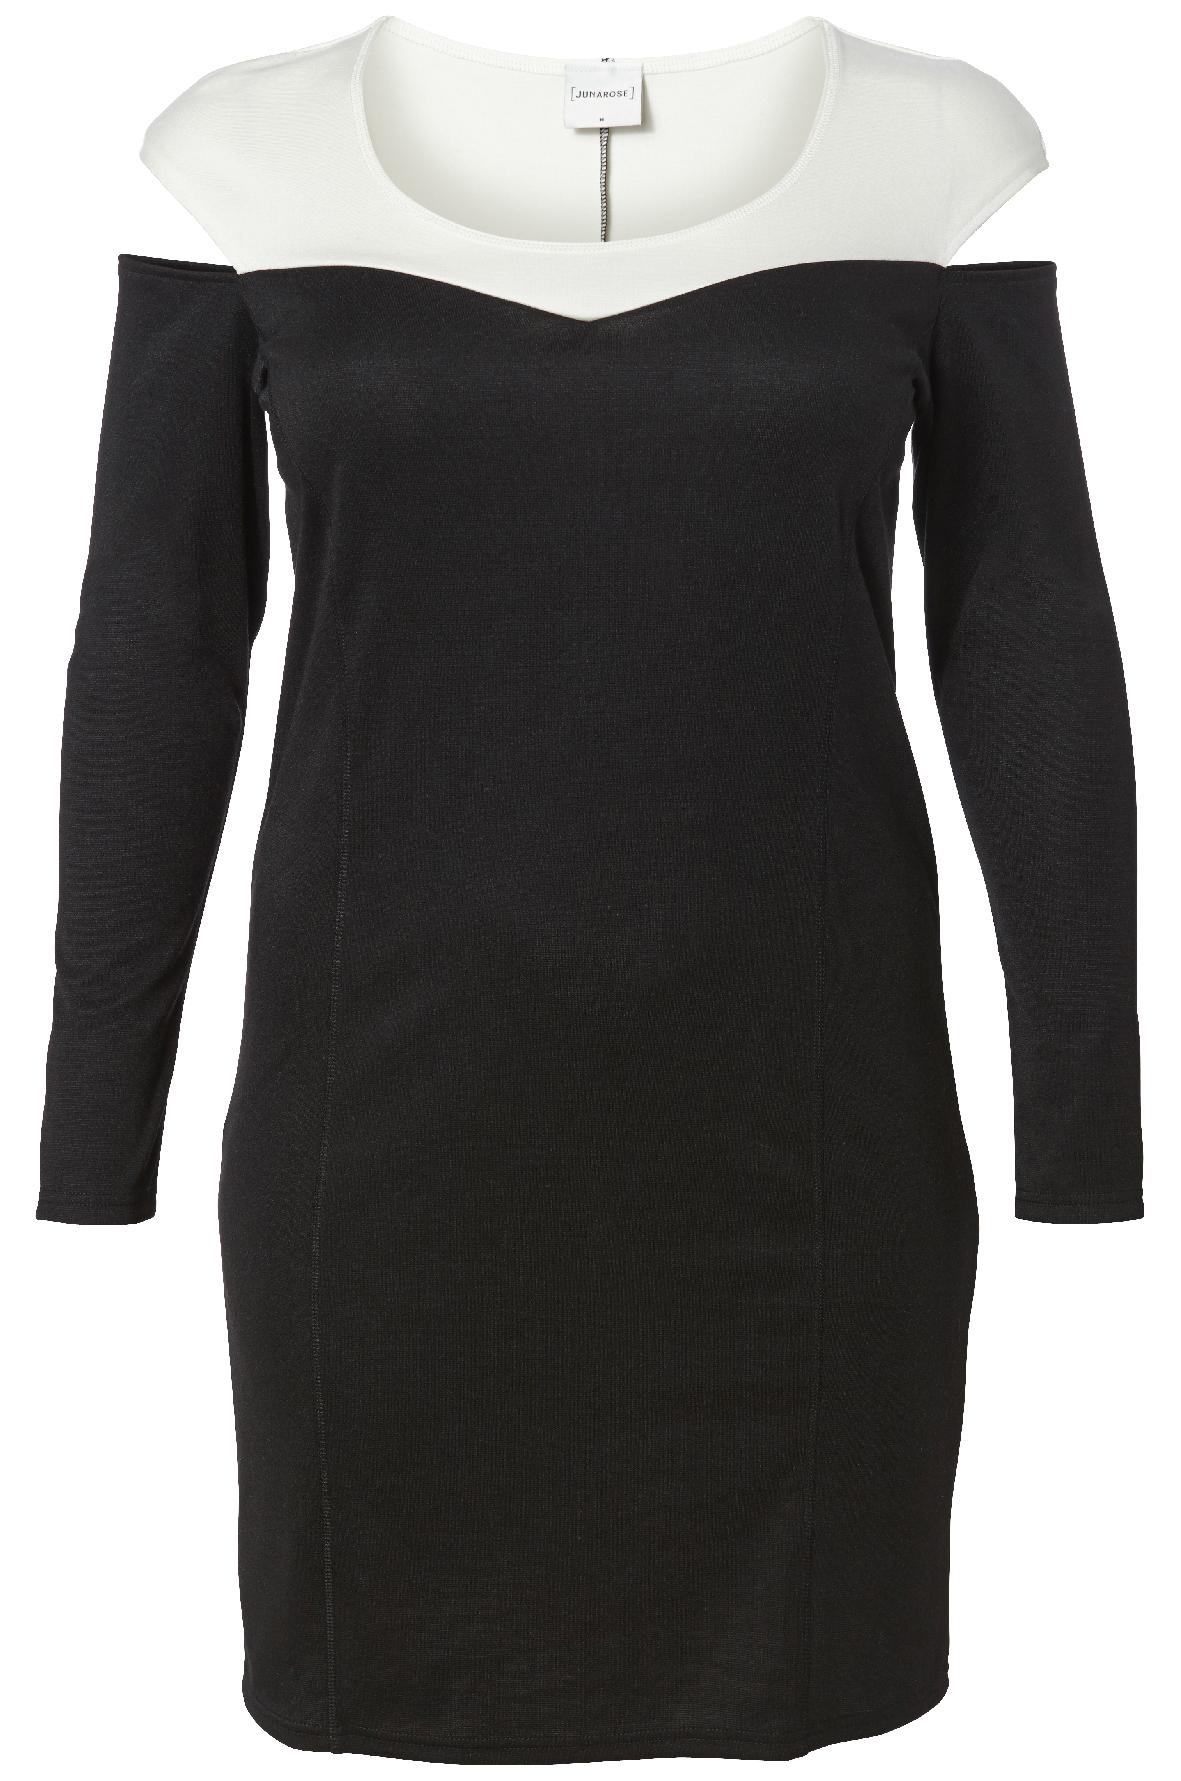 Black Dress svg #1, Download drawings